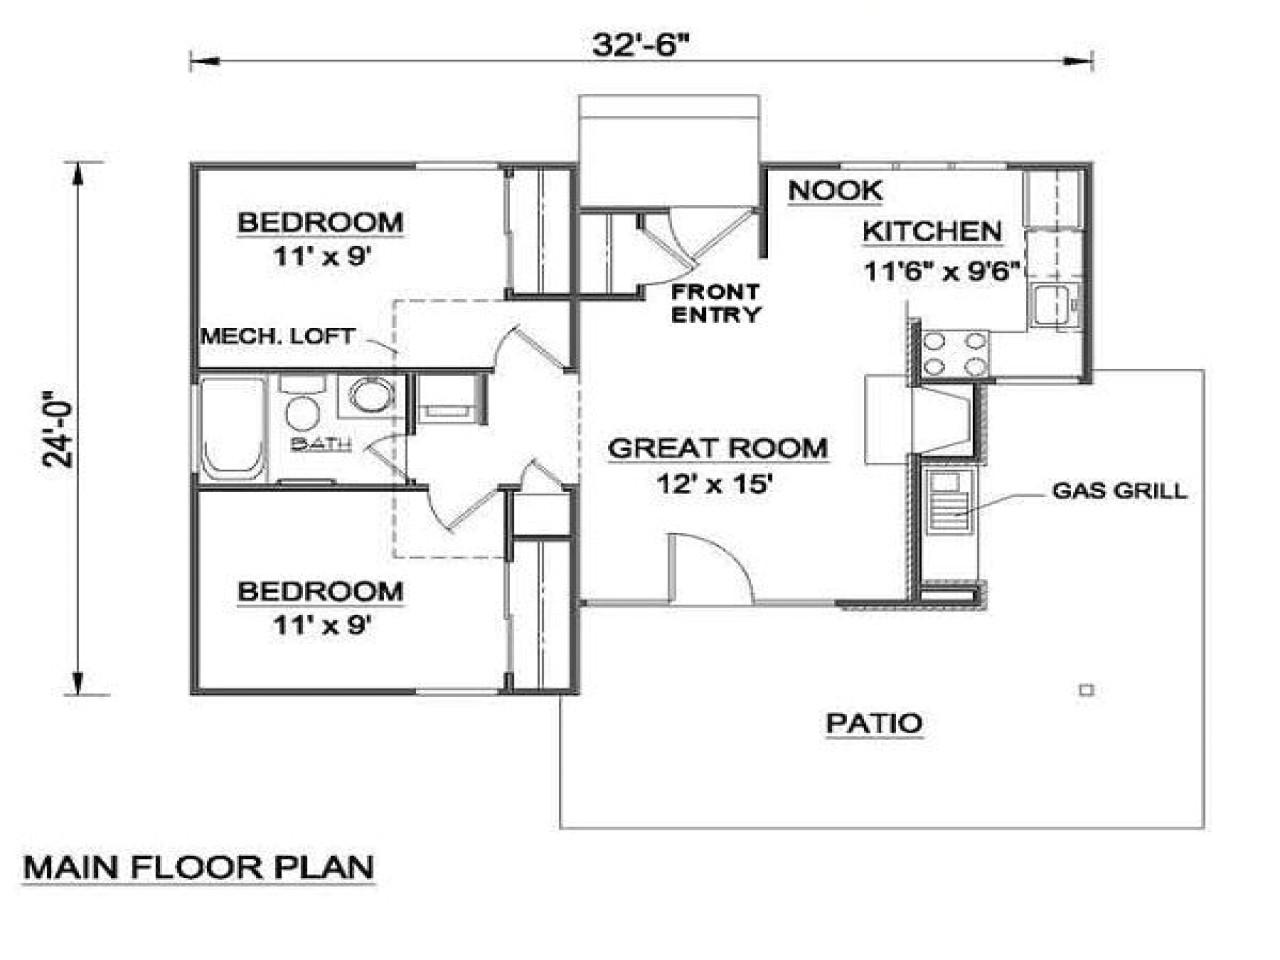 a97b78ce9e920be1 700 sq ft house plans 700 sq ft apartment